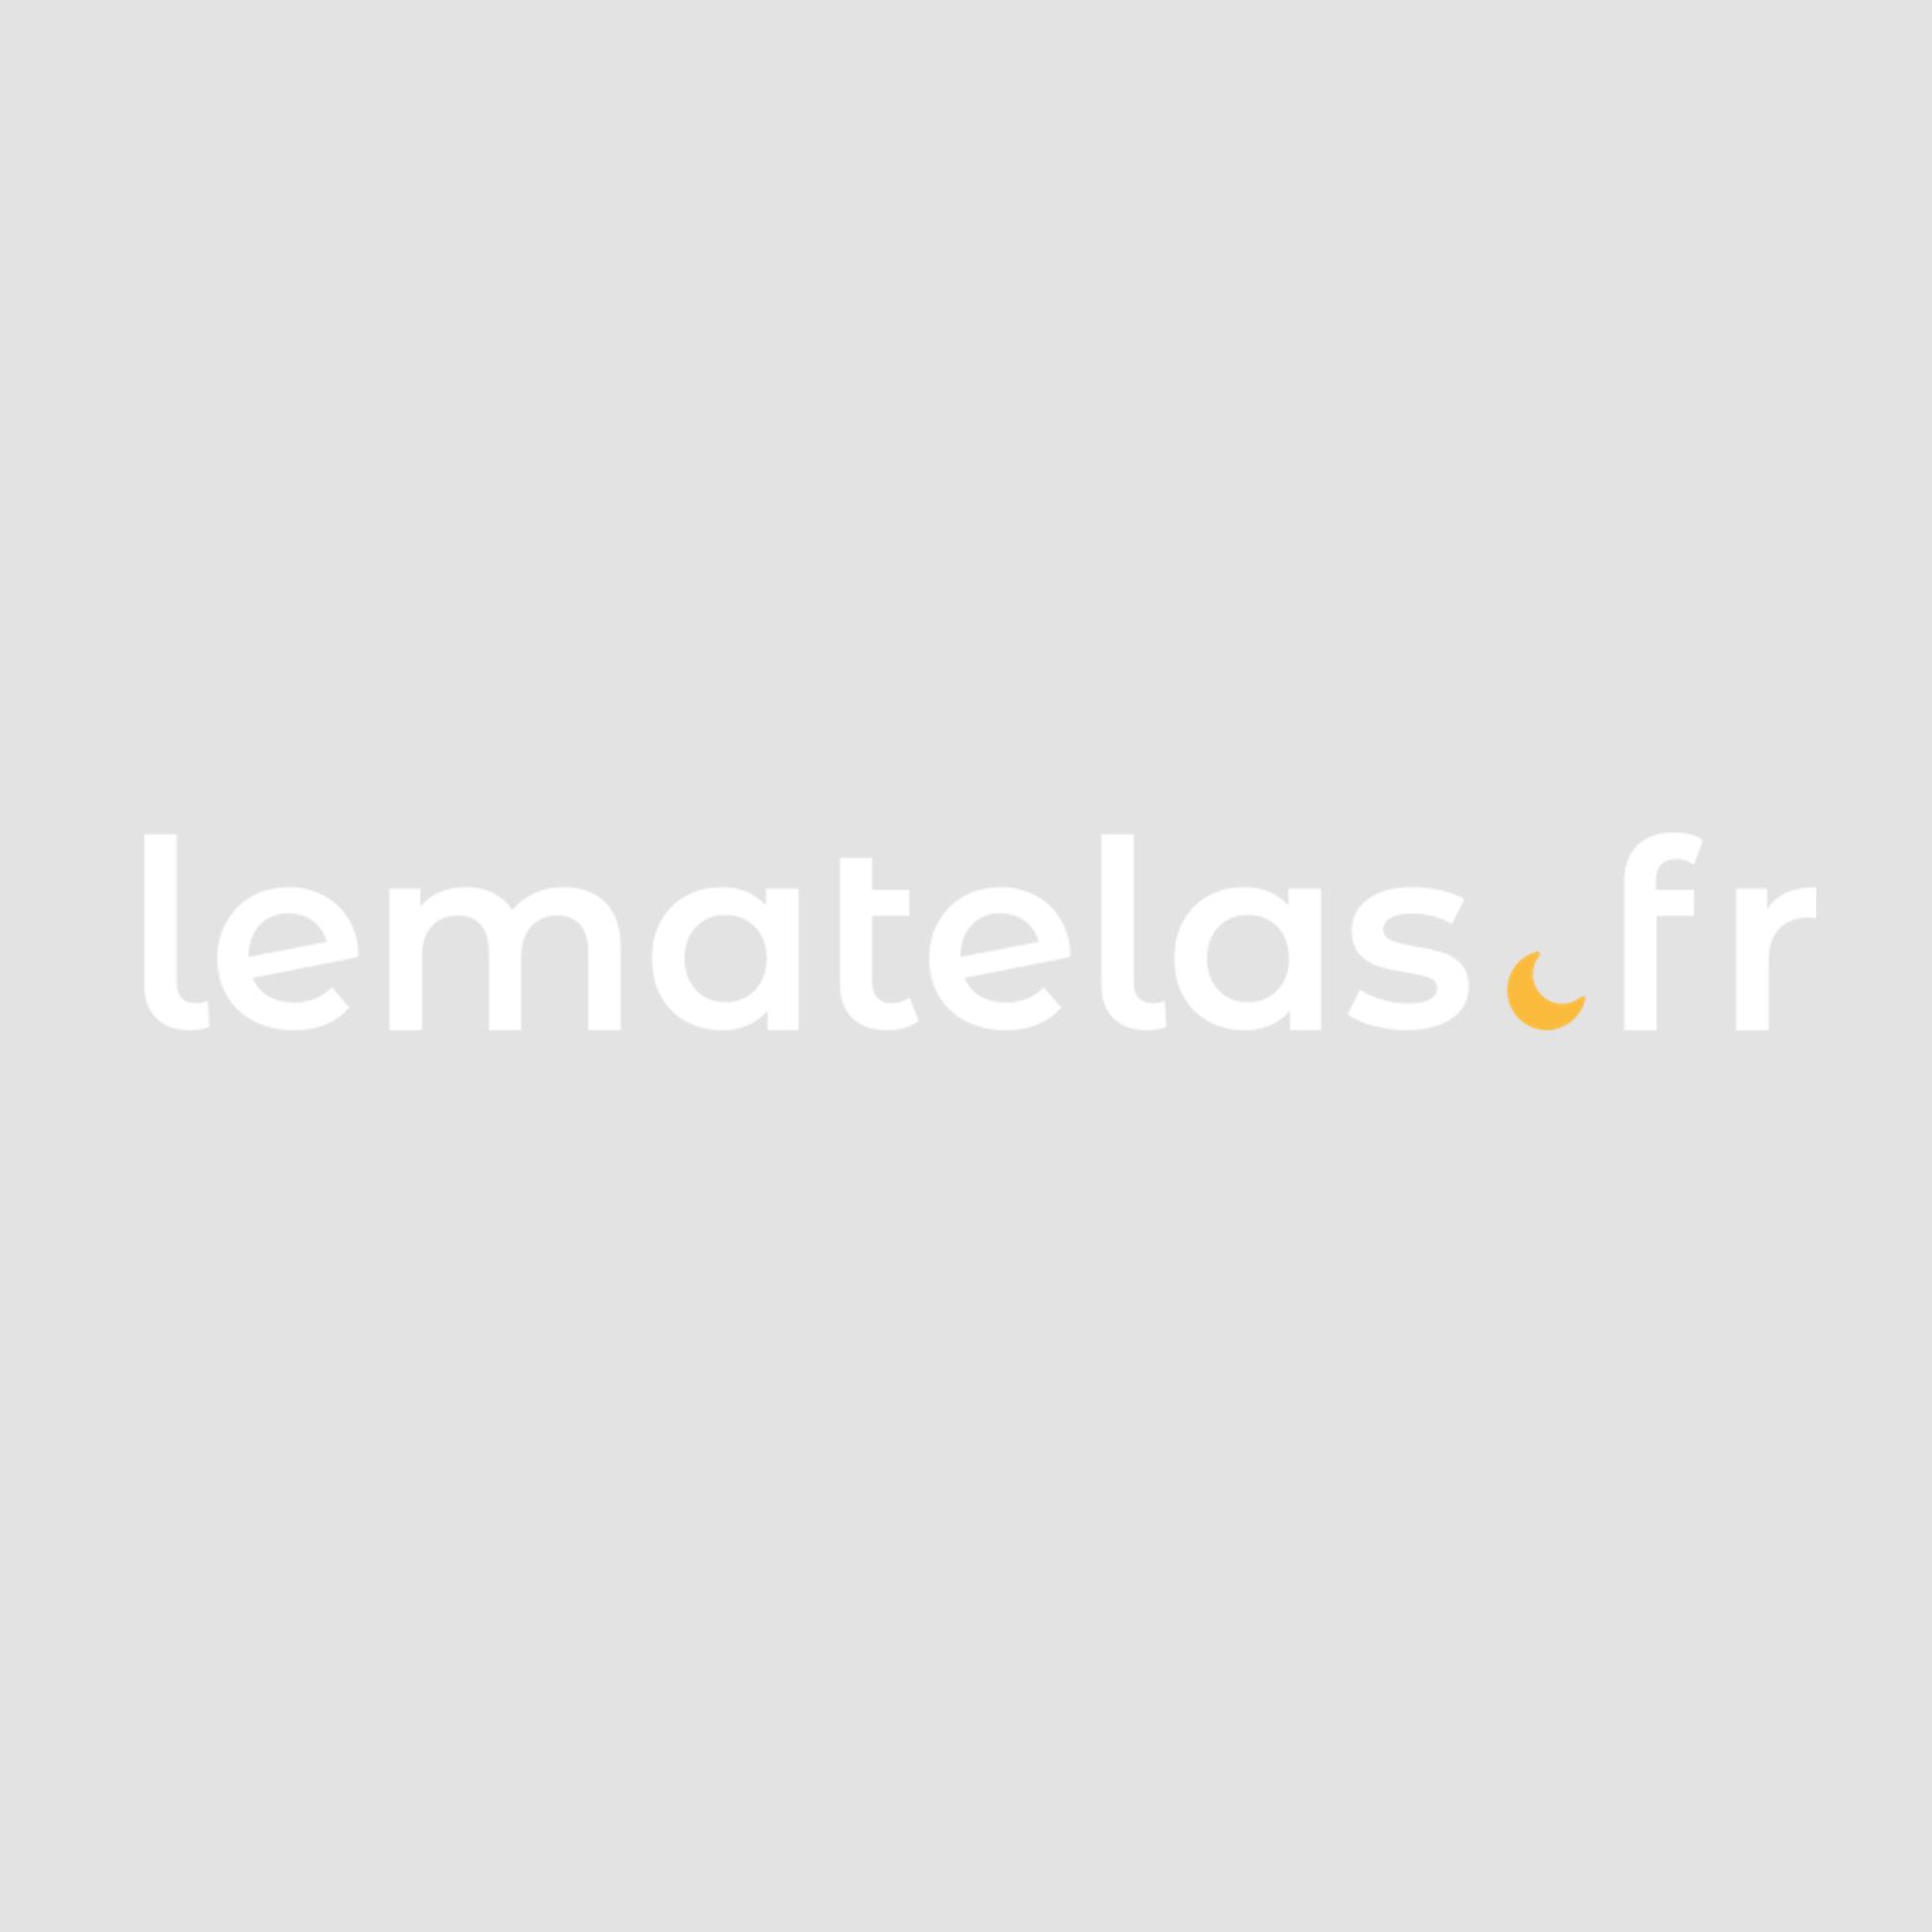 prot ge matelas molleton blanc 100 coton bonnet 25 cm. Black Bedroom Furniture Sets. Home Design Ideas